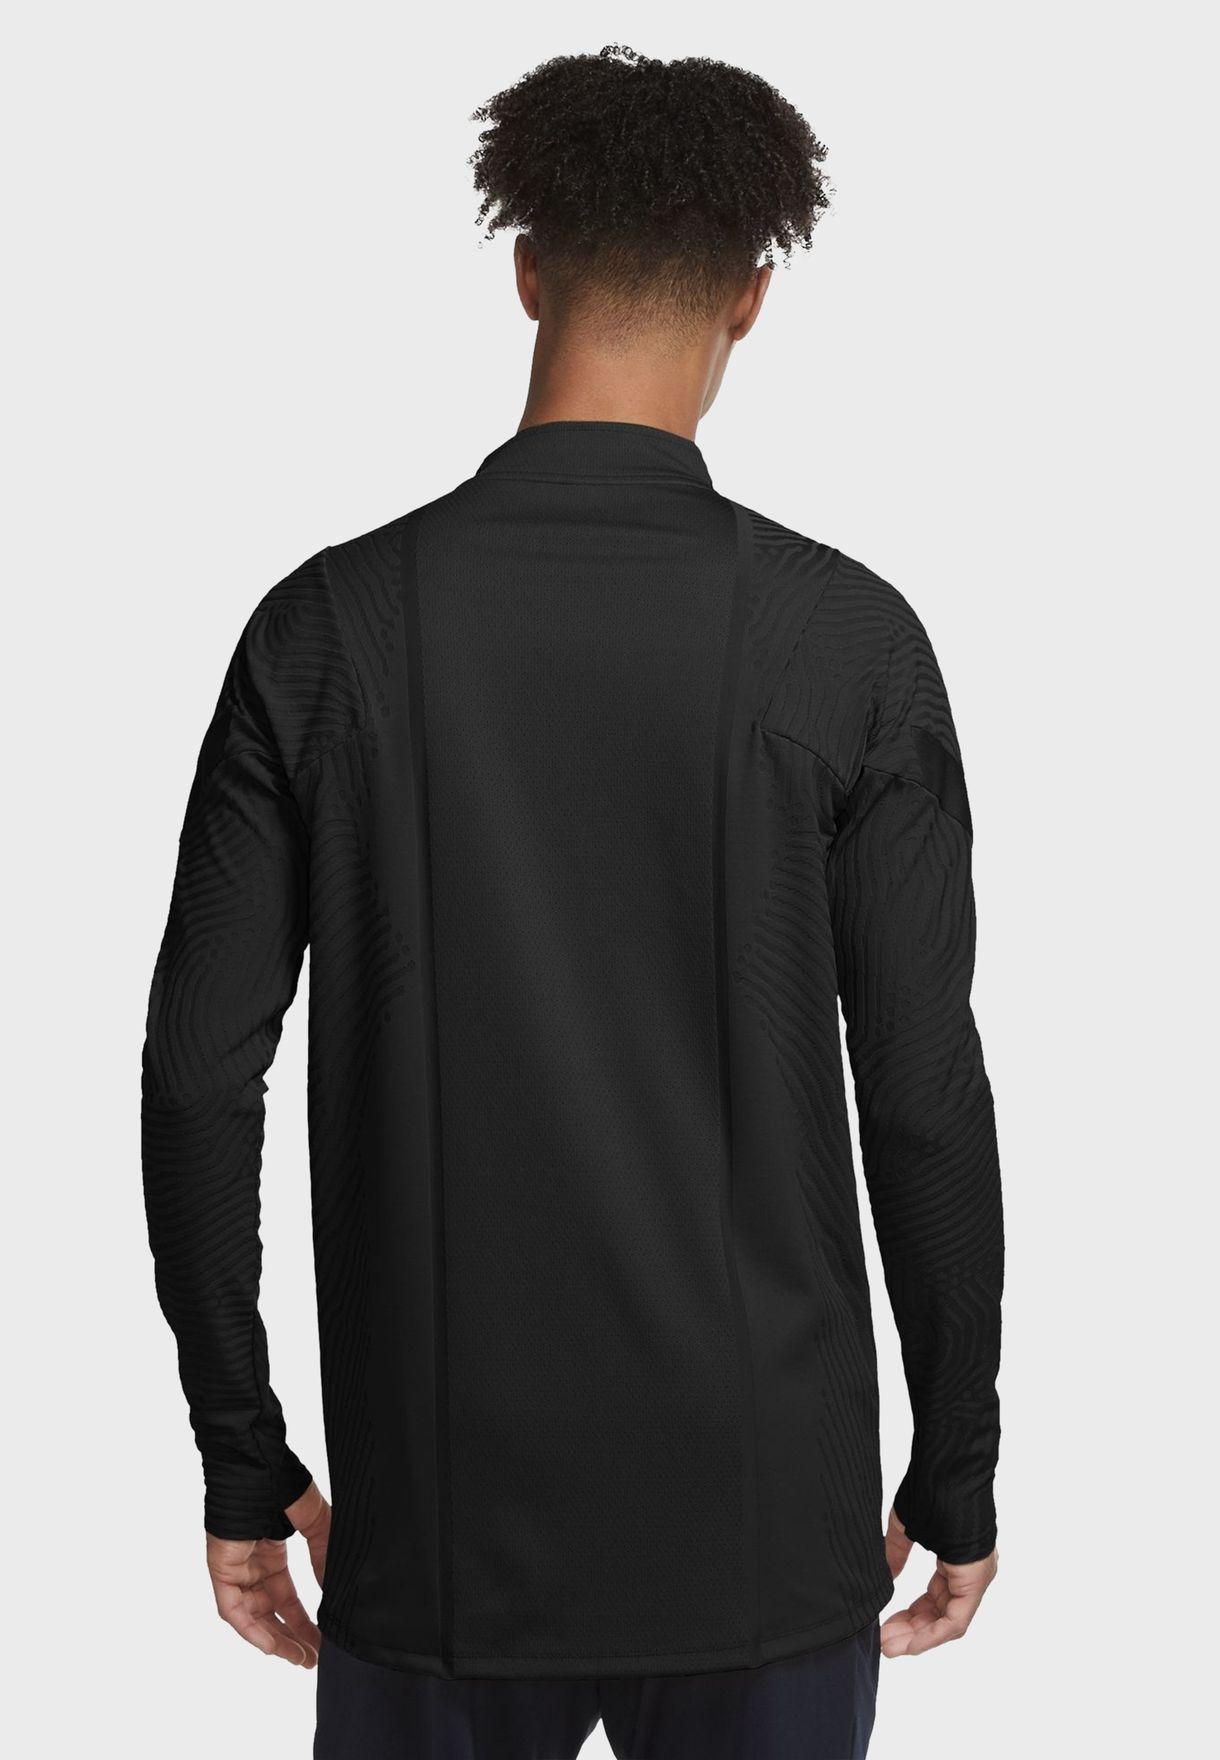 PSG Vaporknit Strike Sweatshirt